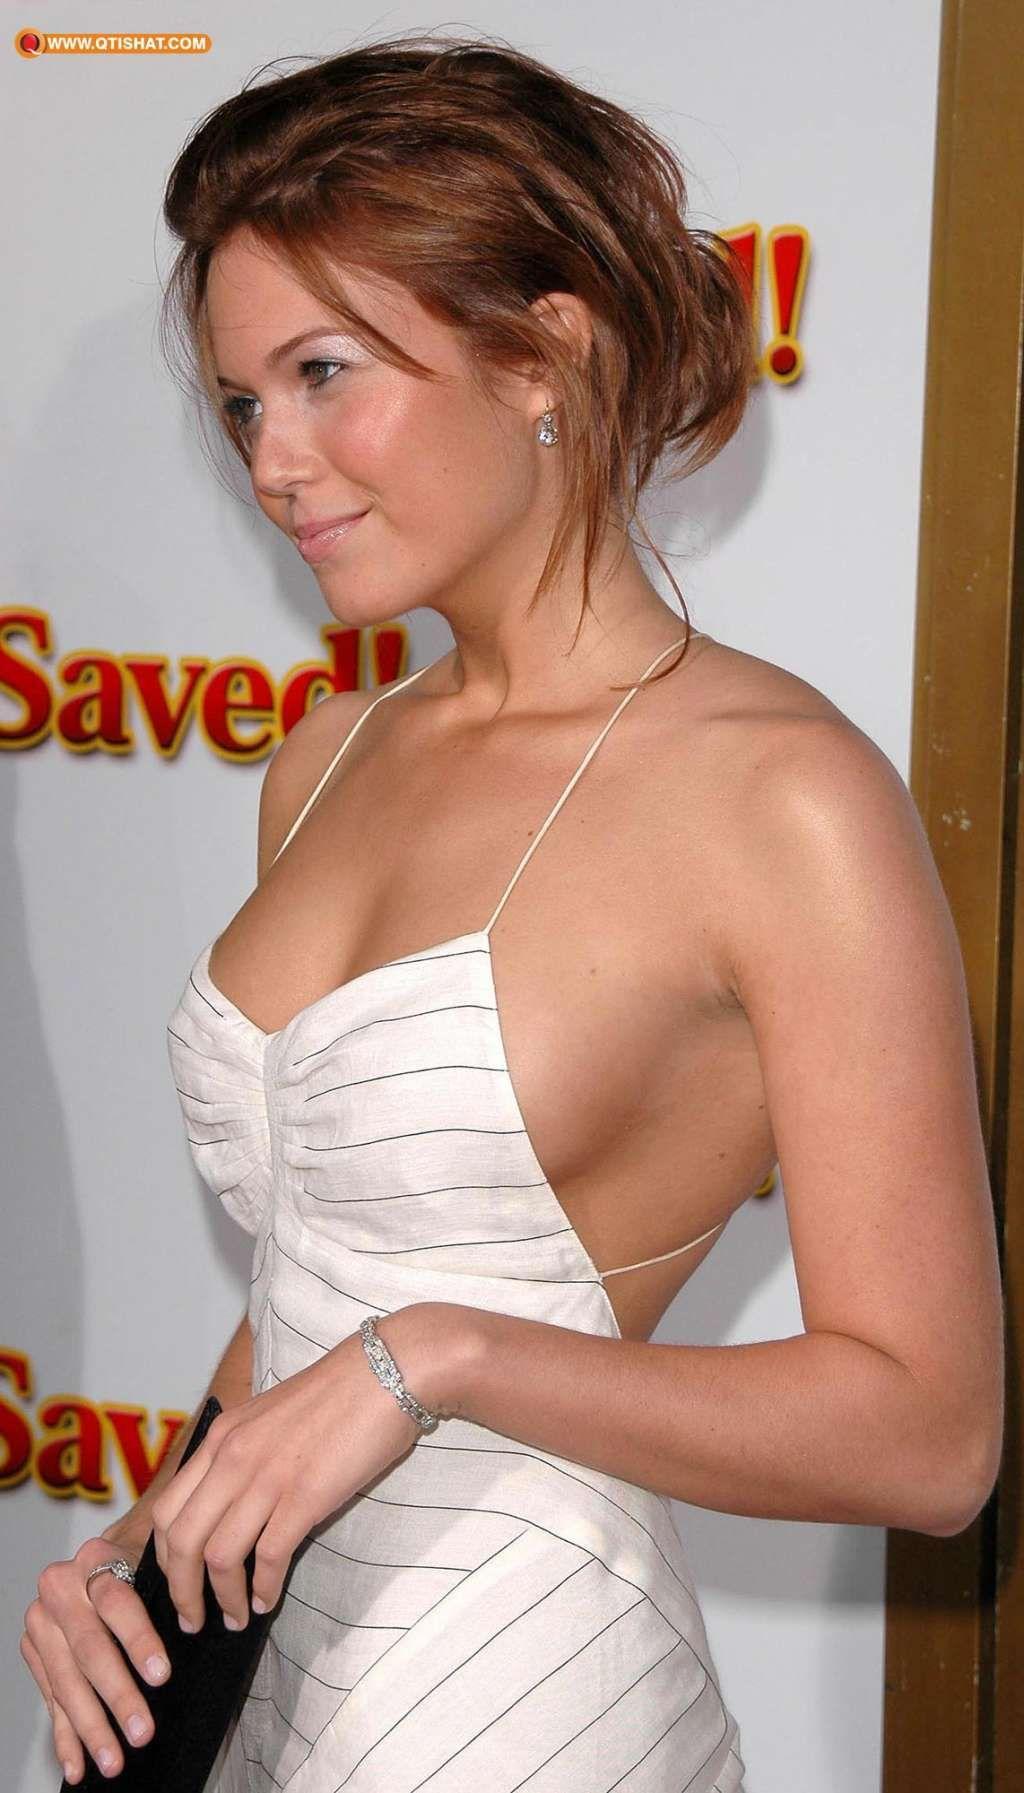 Sexy Diane Lane Hot Pics Photos